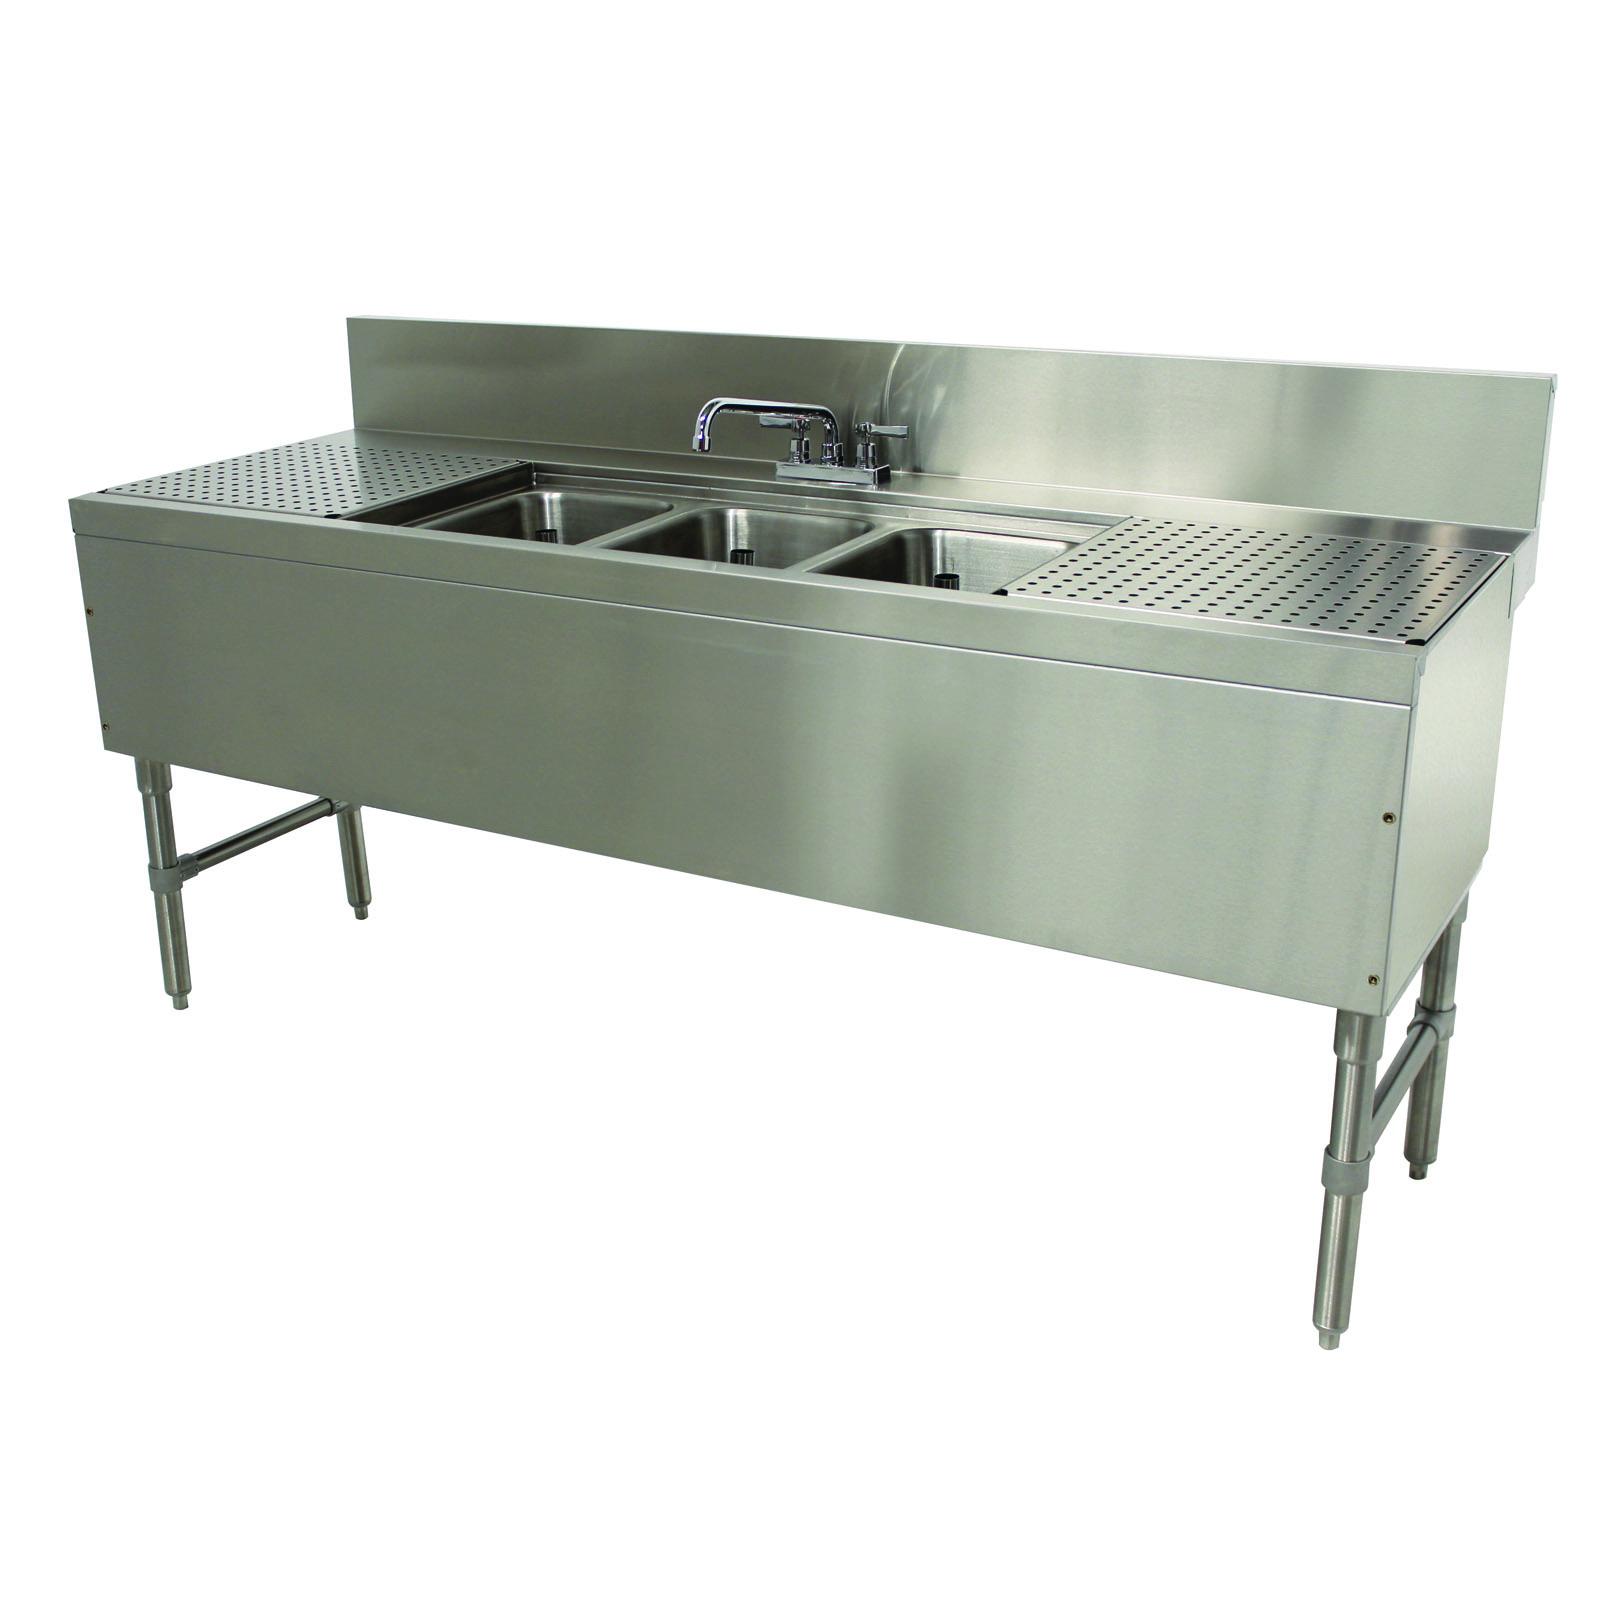 Advance Tabco PRB-24-63C underbar sink units